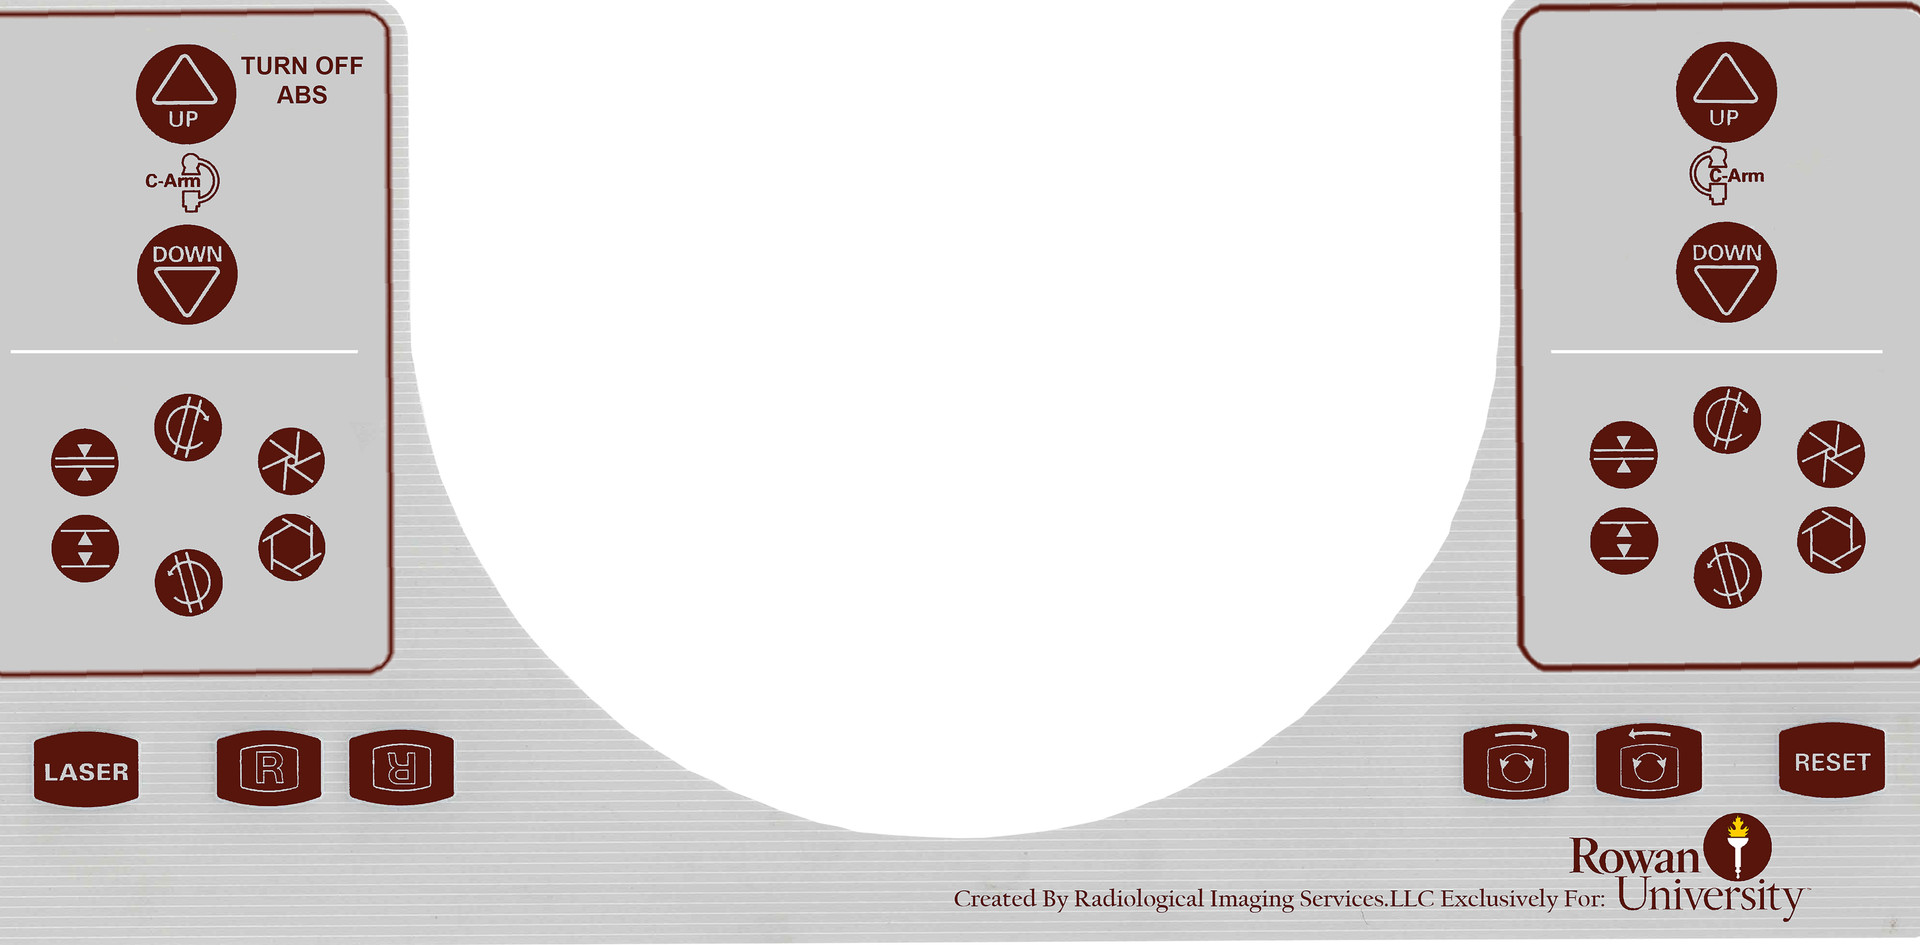 KMC 950 DISPLAY LABELS- ROWAN - final jp